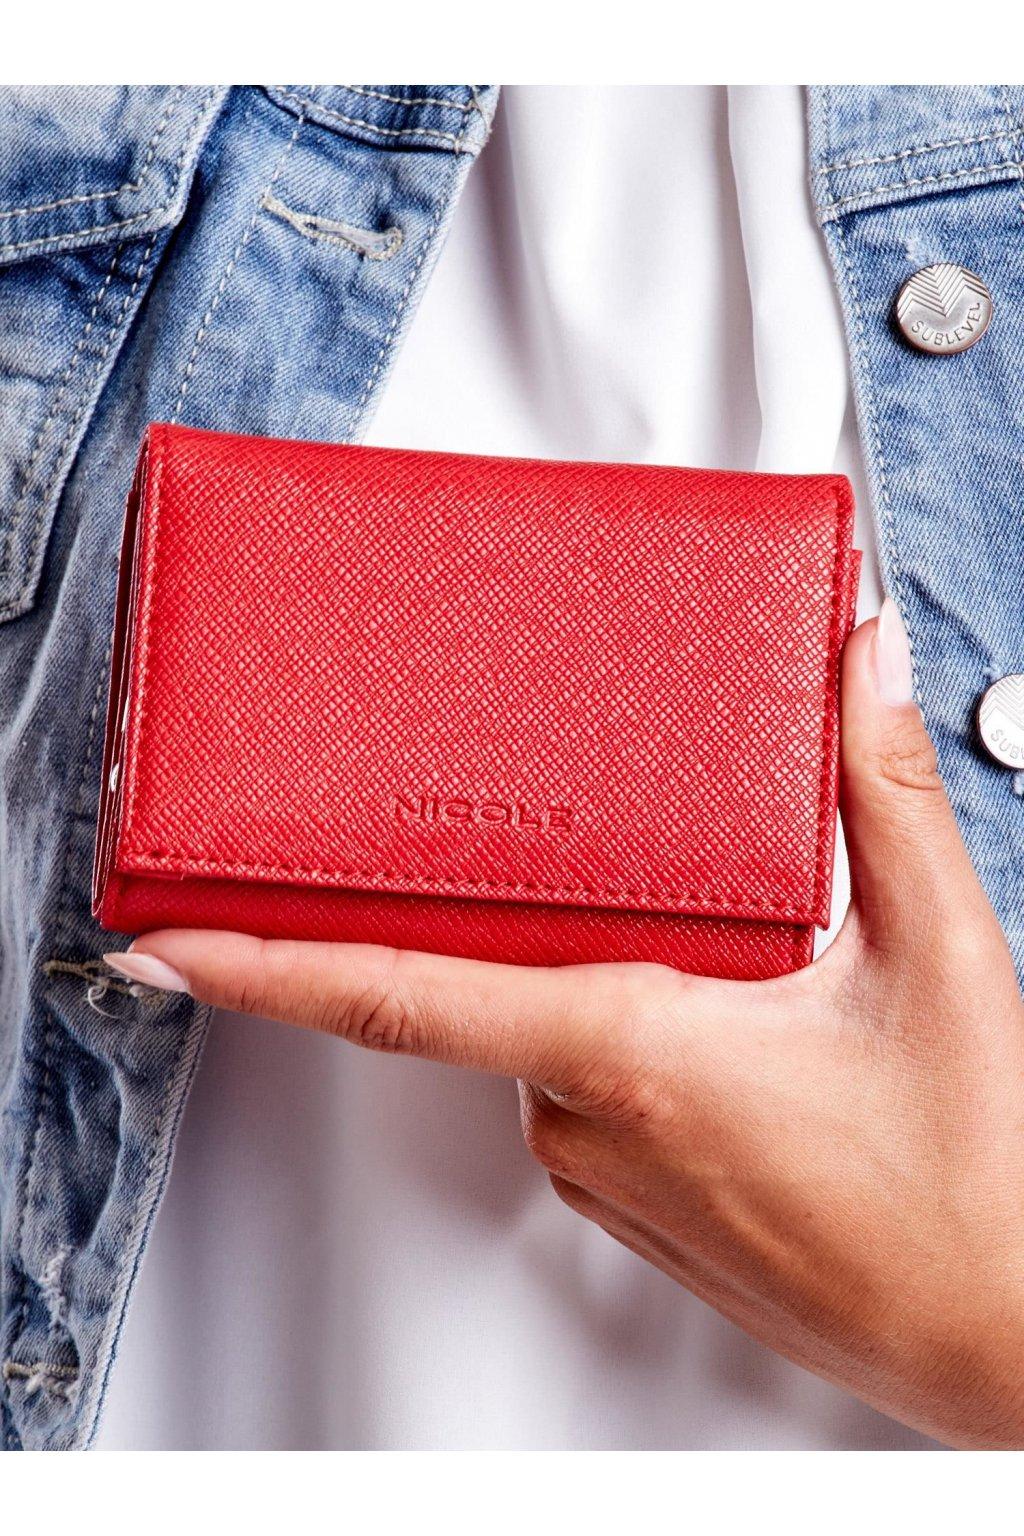 Peňaženka kód G104-1620